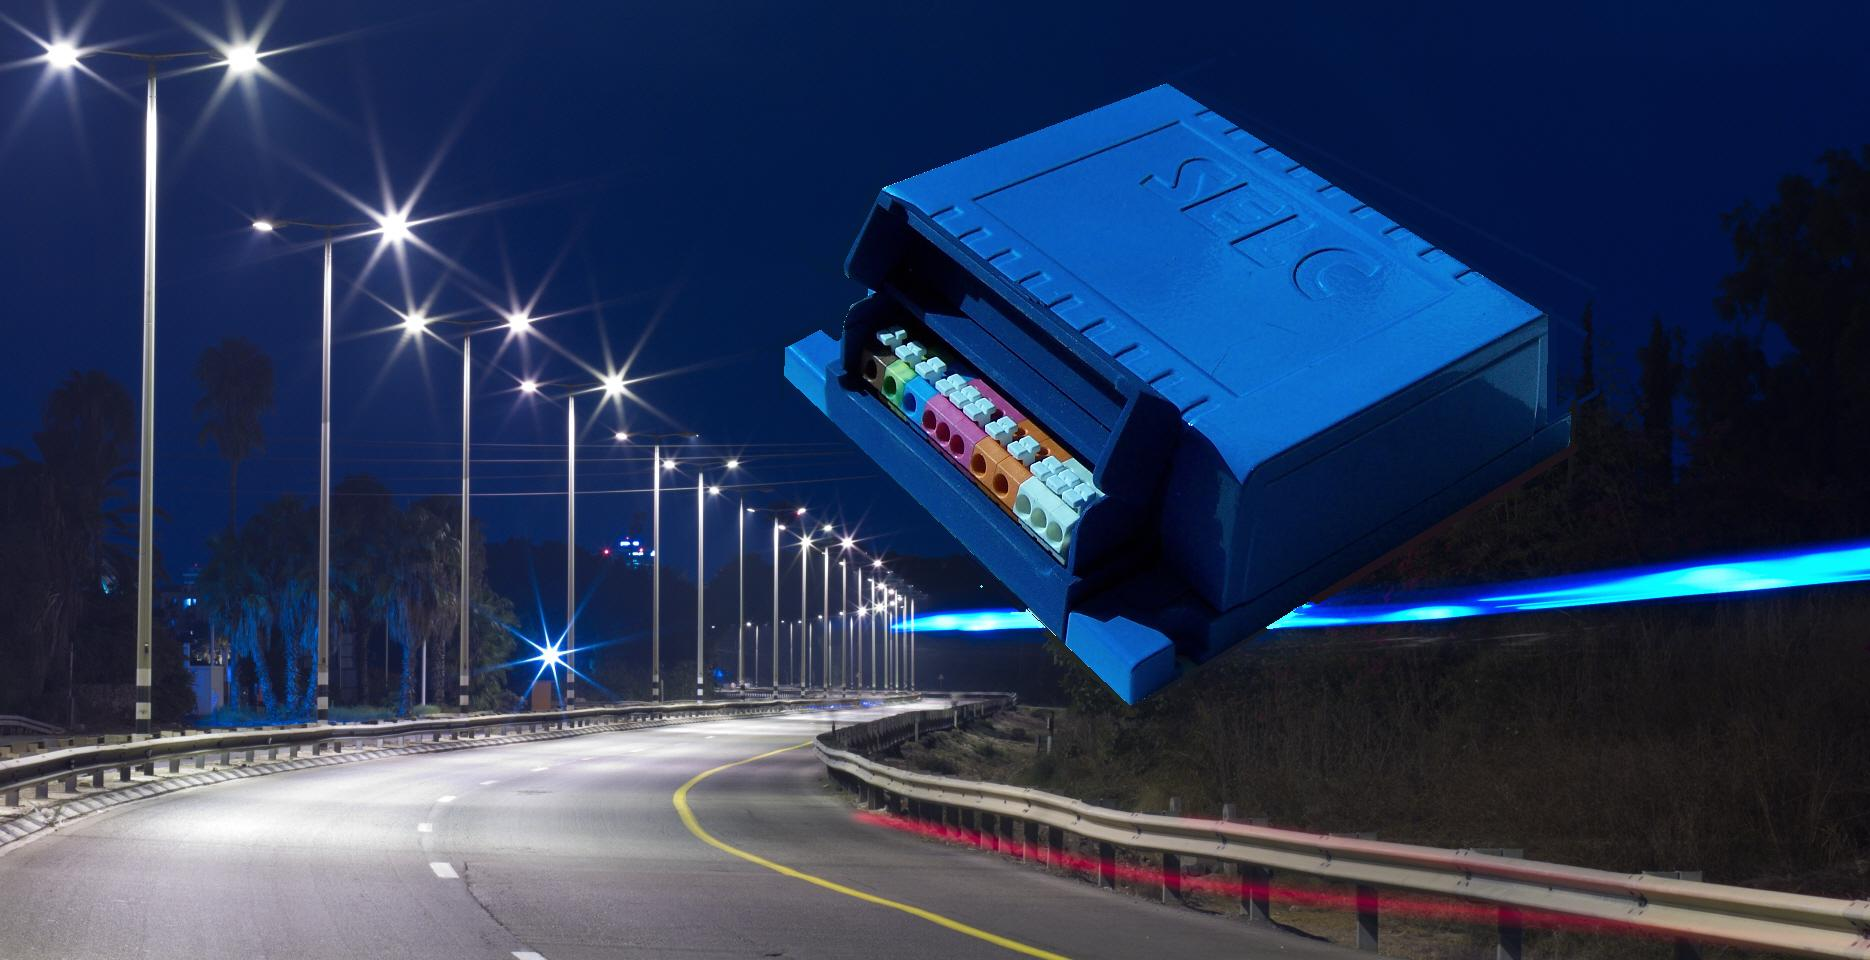 street-lights-1260x960-ballast